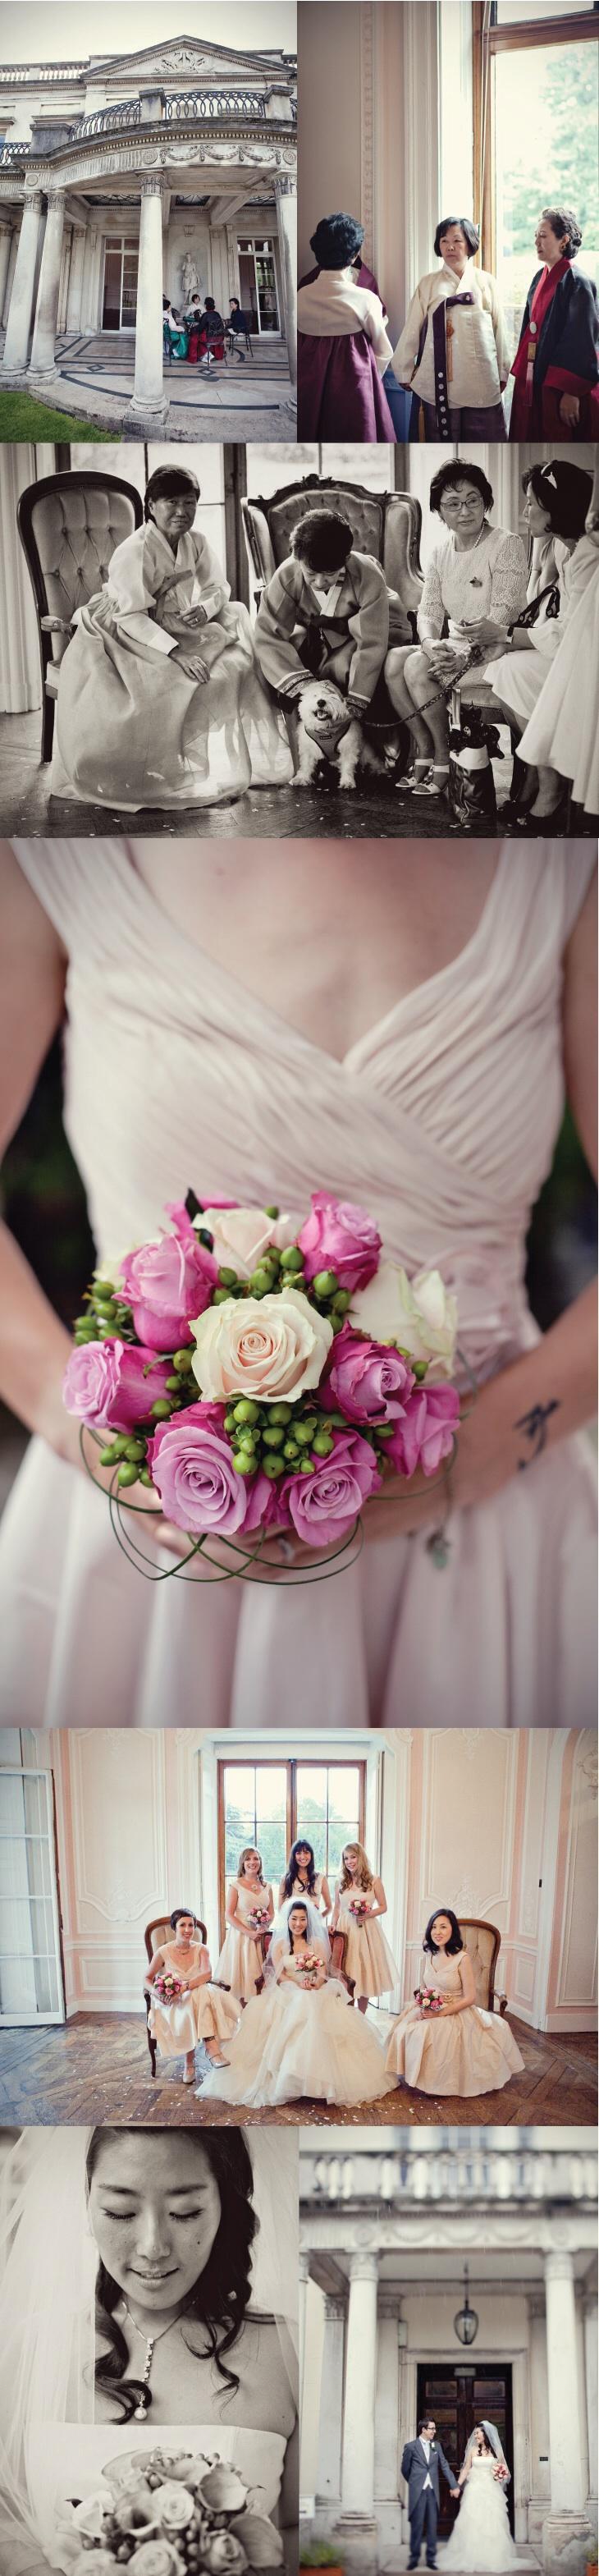 Korean English Fairytale Wedding by Marianne Taylor Photography